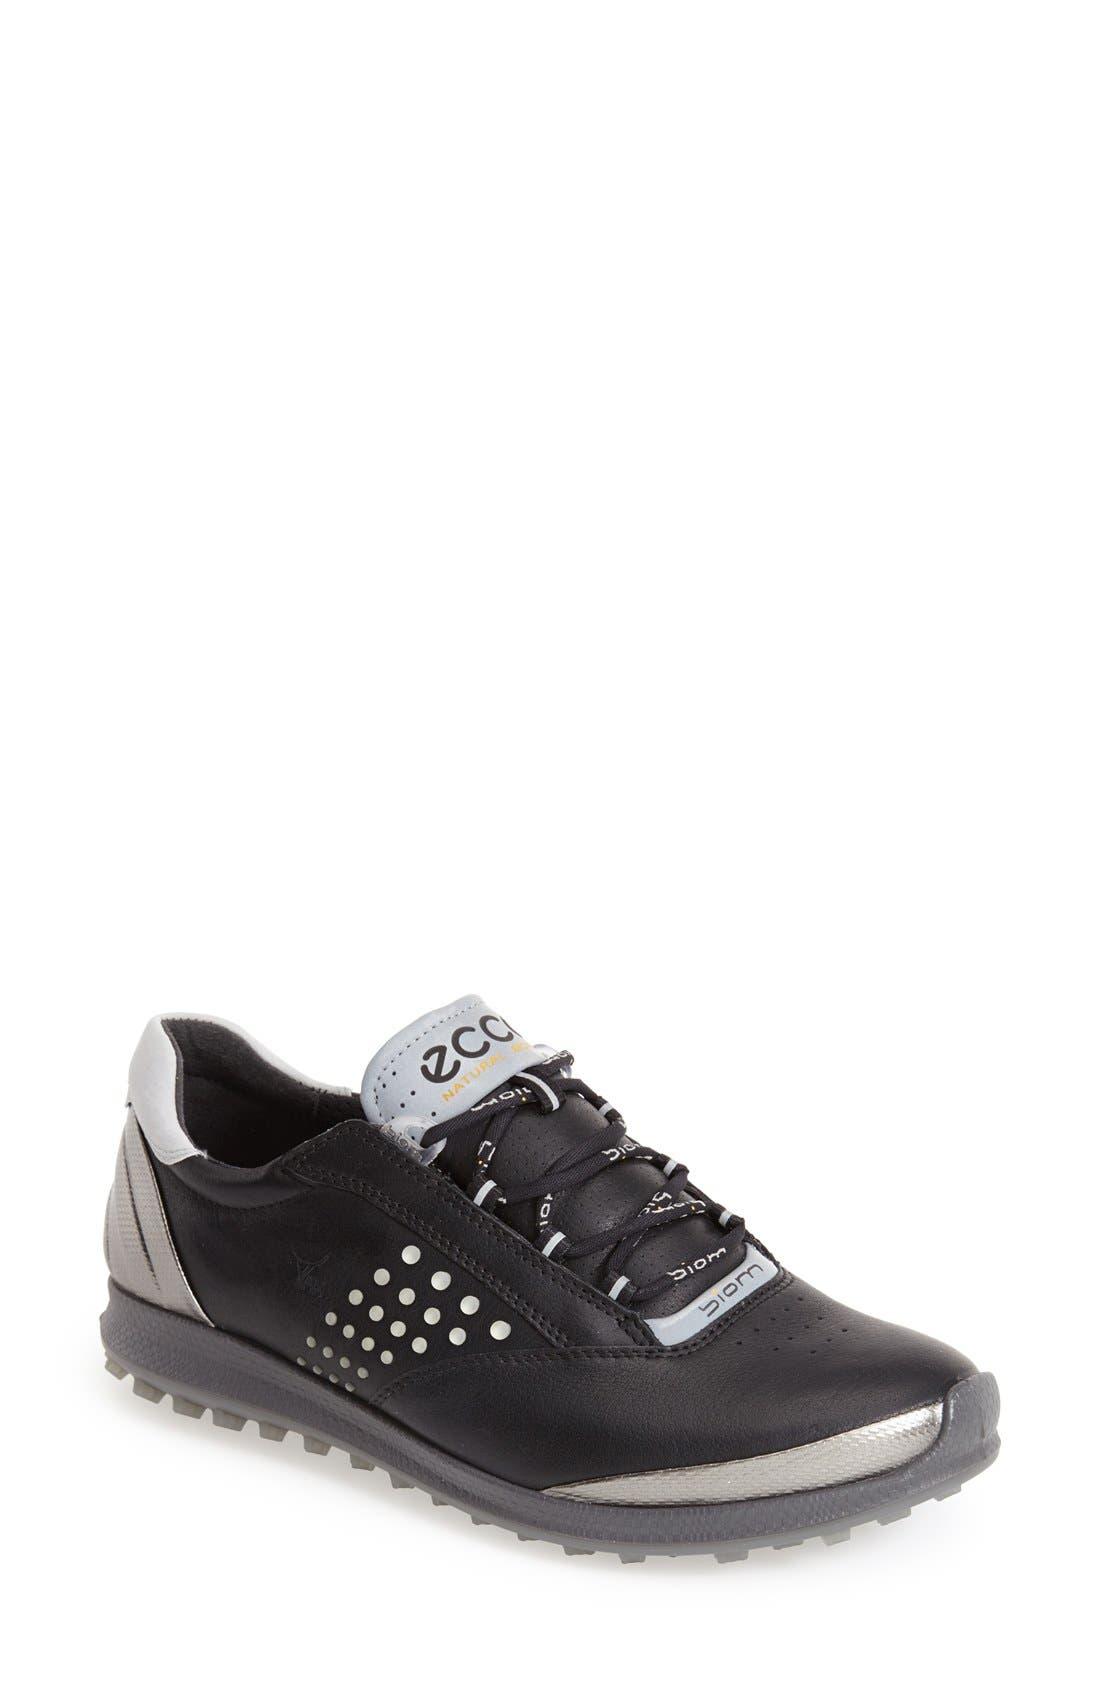 'BIOM' Hydromax<sup>®</sup> Waterproof Golf Shoe,                         Main,                         color, 007